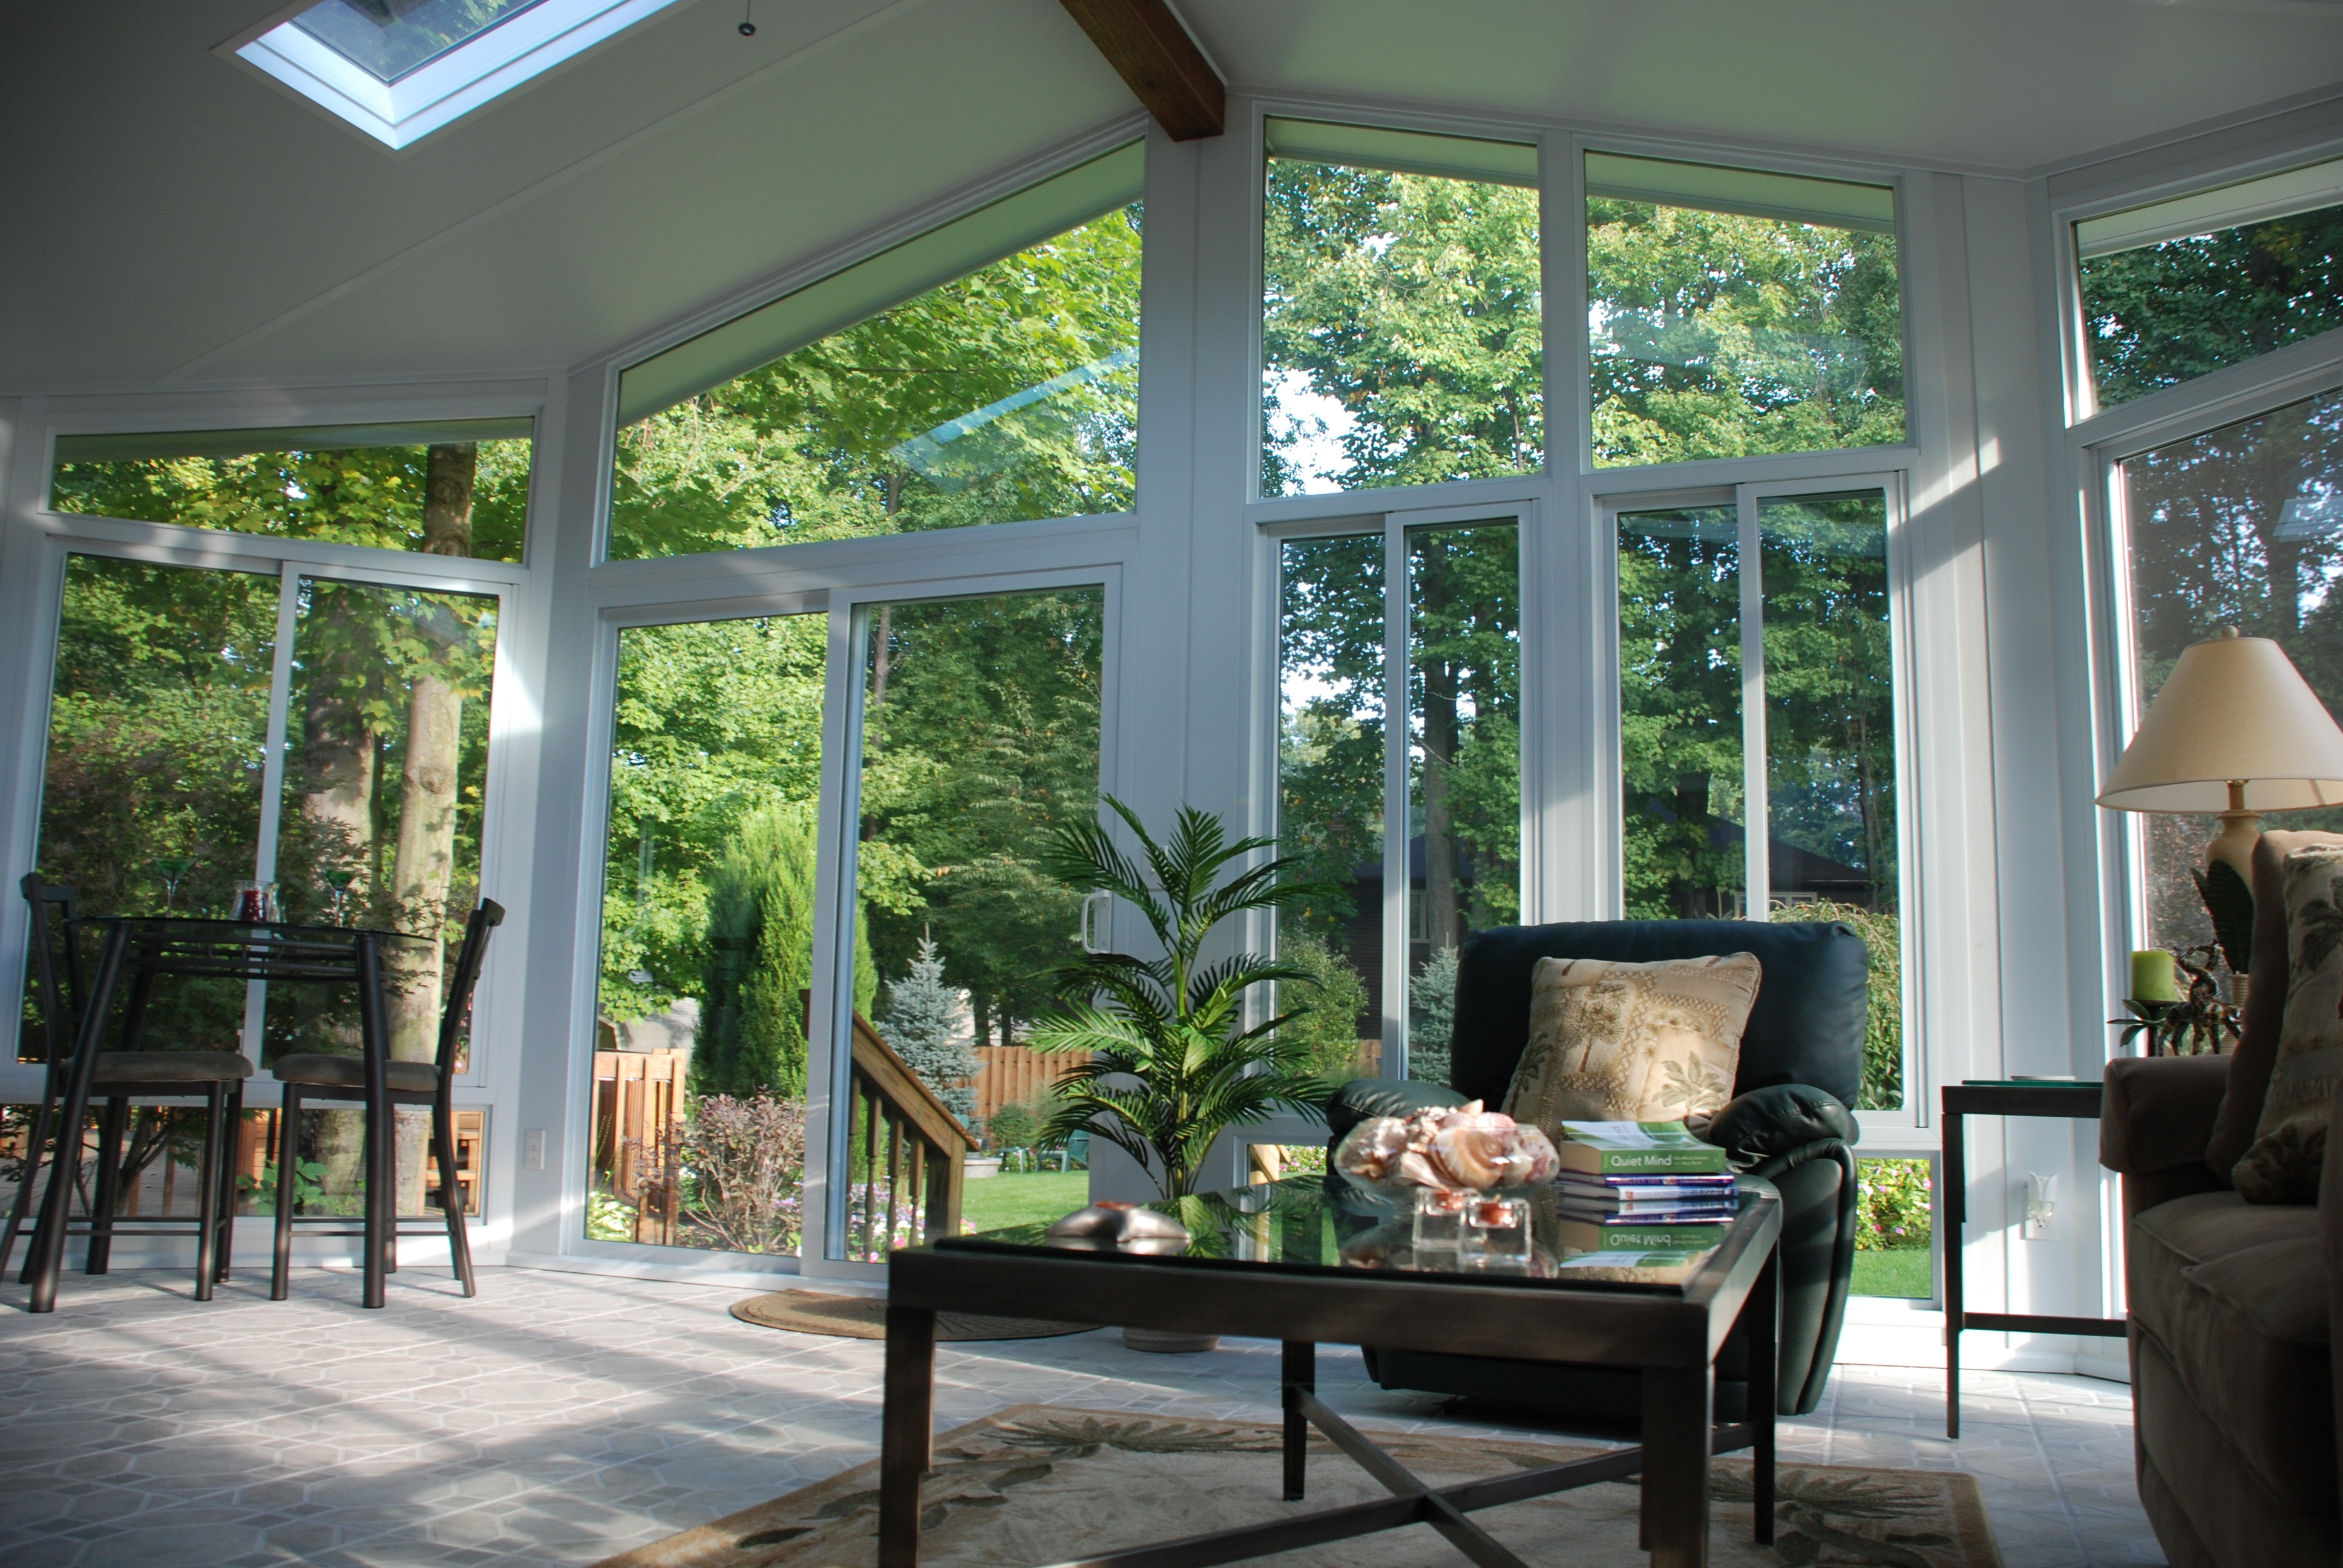 Thermal Shield Windows & Sunrooms image 2